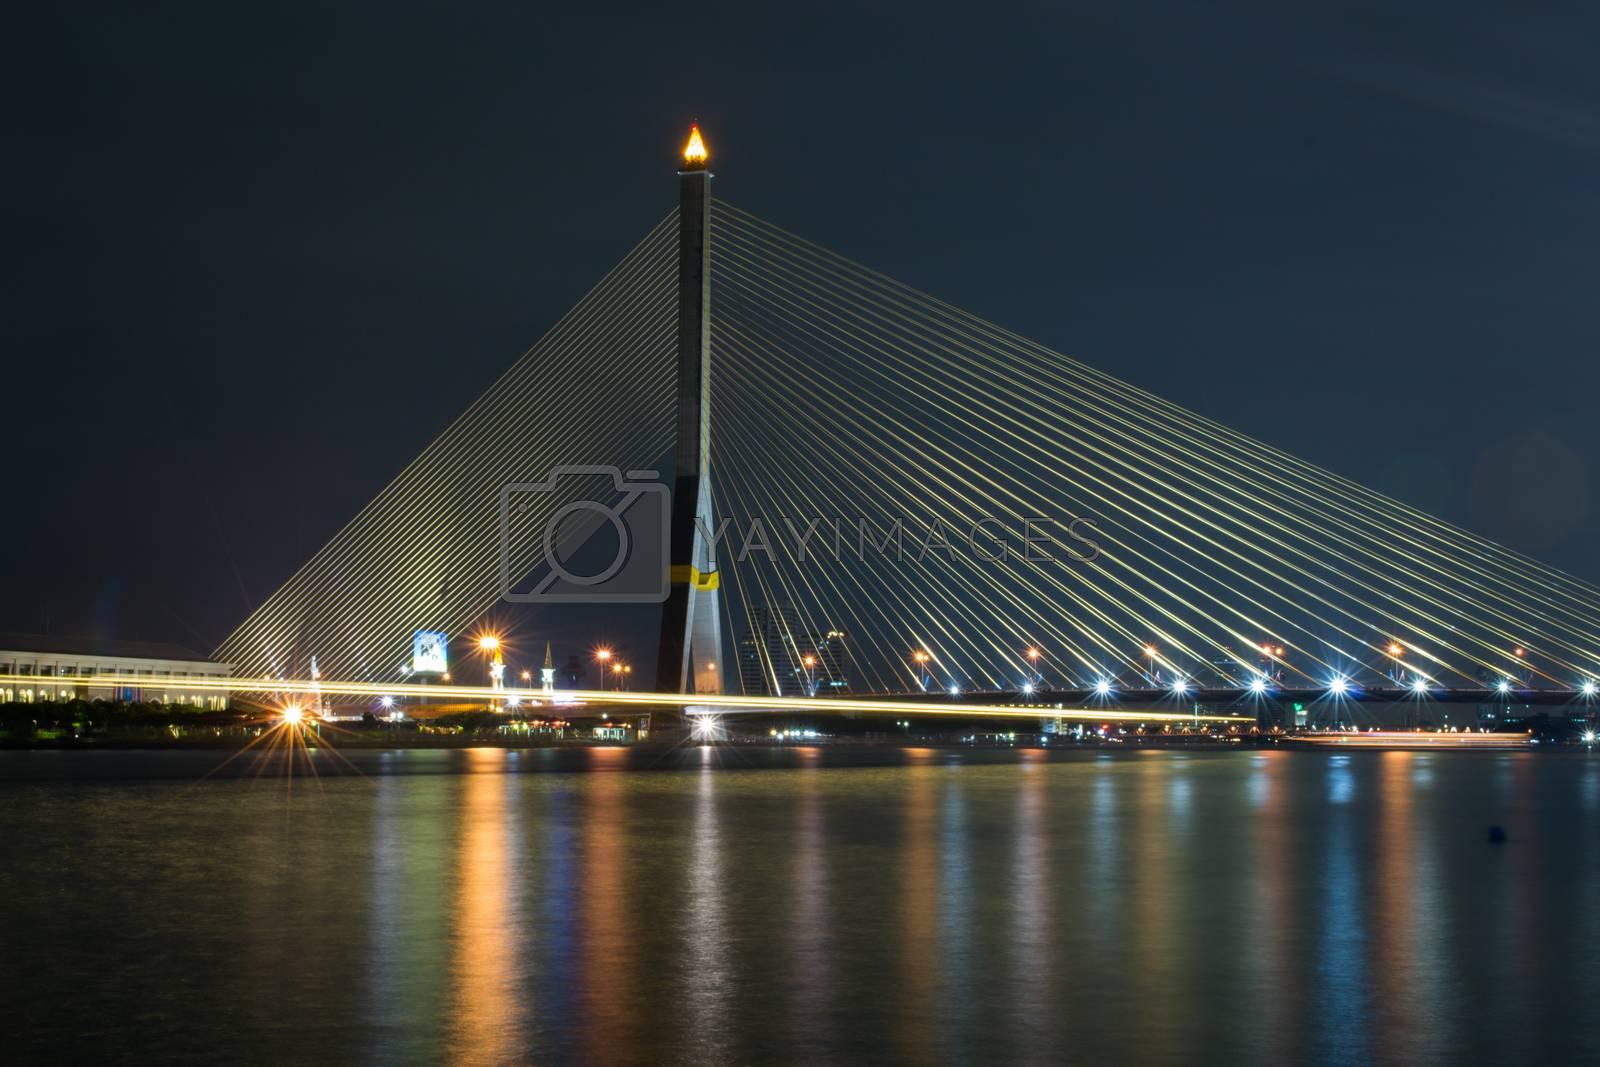 cityscape Bridge river view in bangkok